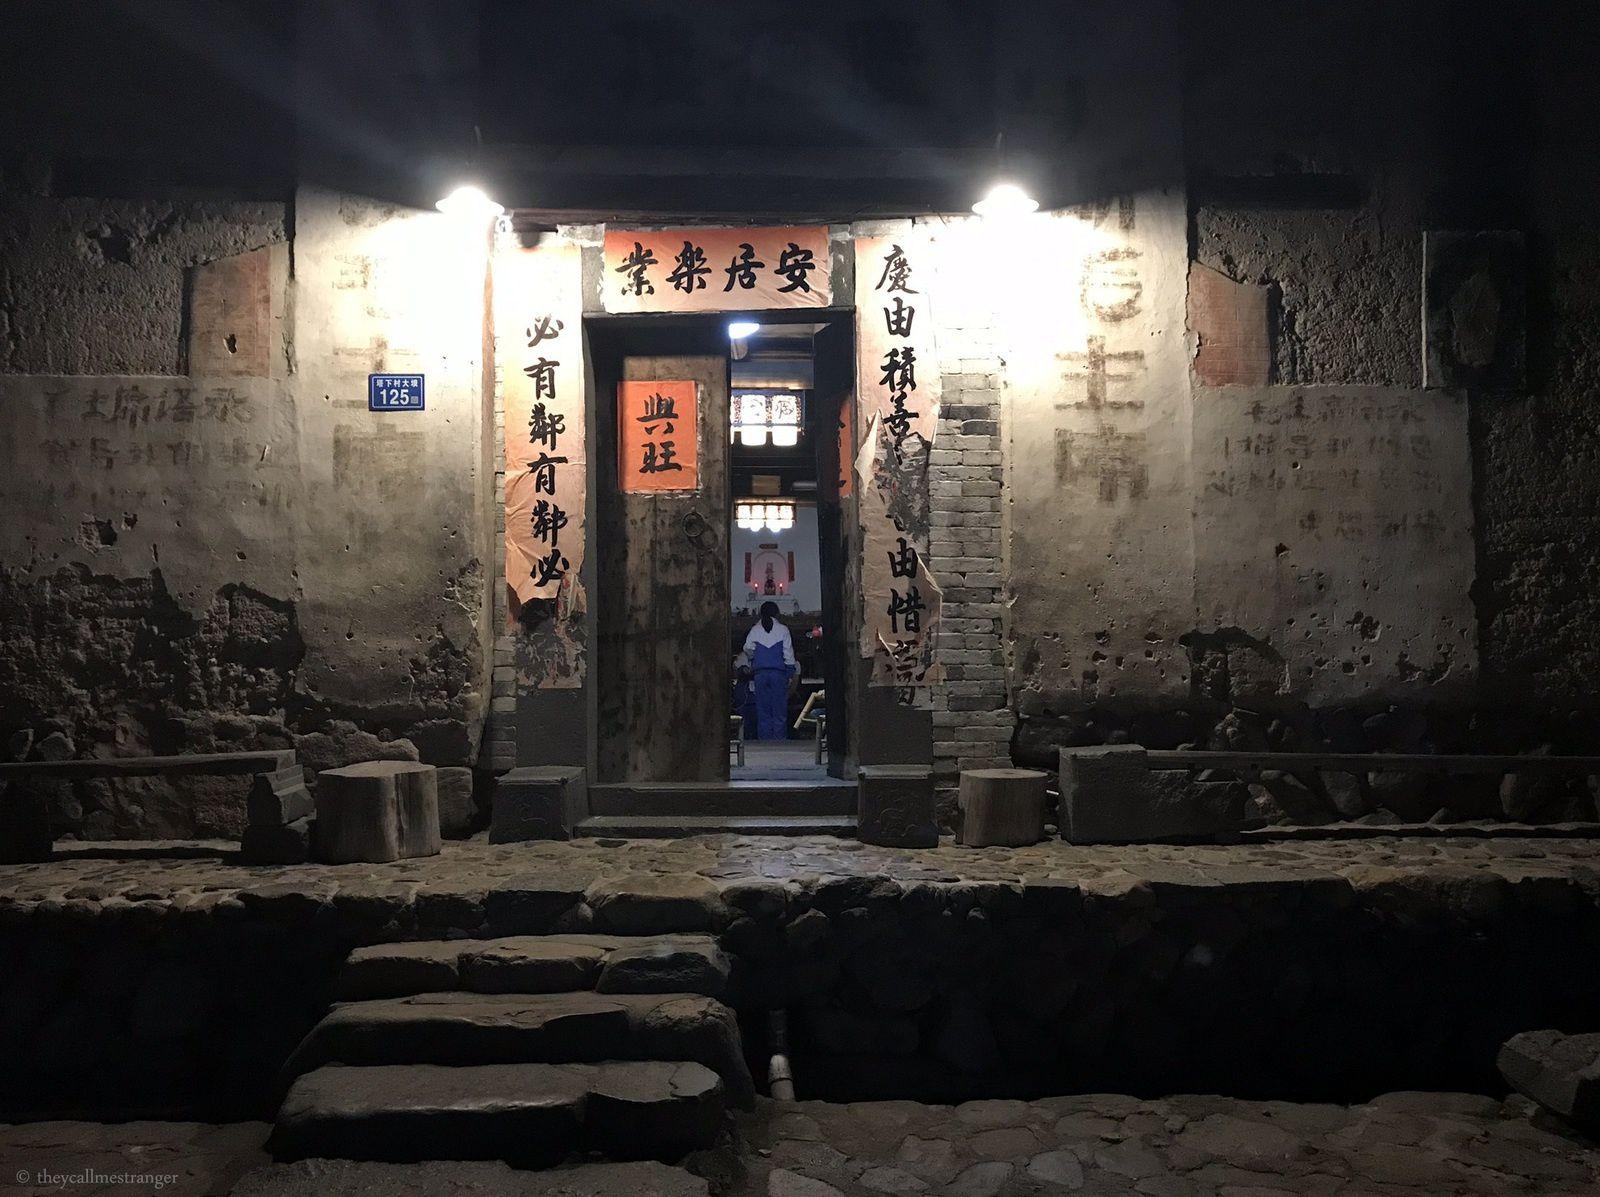 Les tulou du Fujian : Jour 1, les tulou de Nanjing 南靖土楼